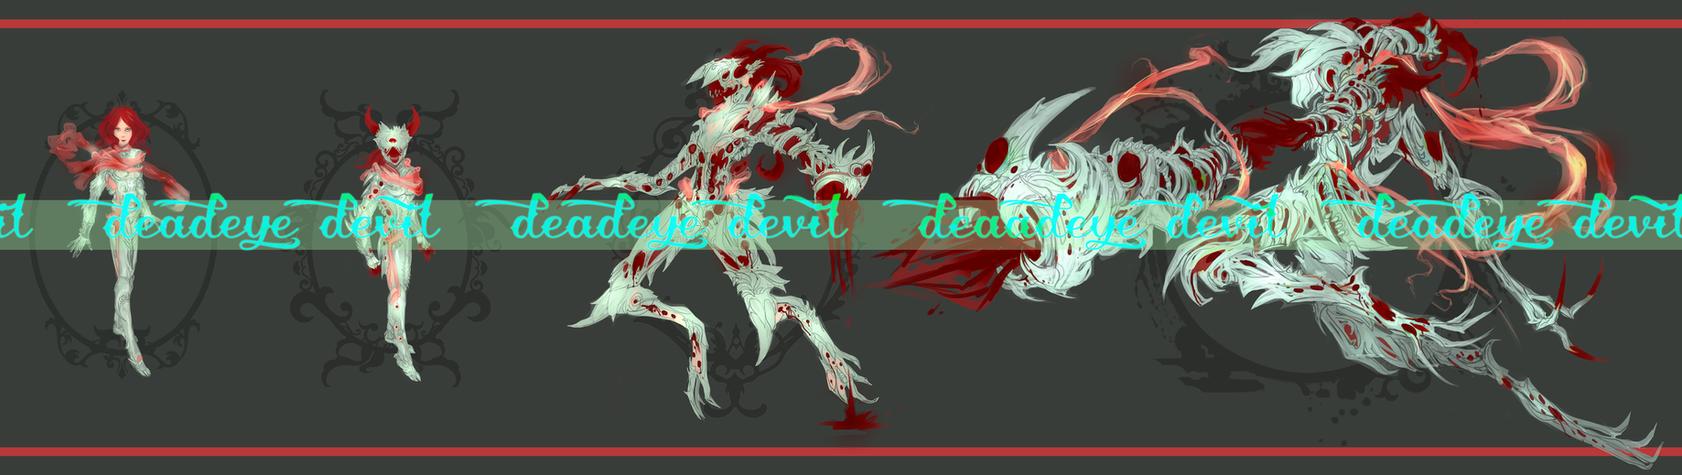 DEADEYE DEVIl adopt [CUSTOM] by ensoul